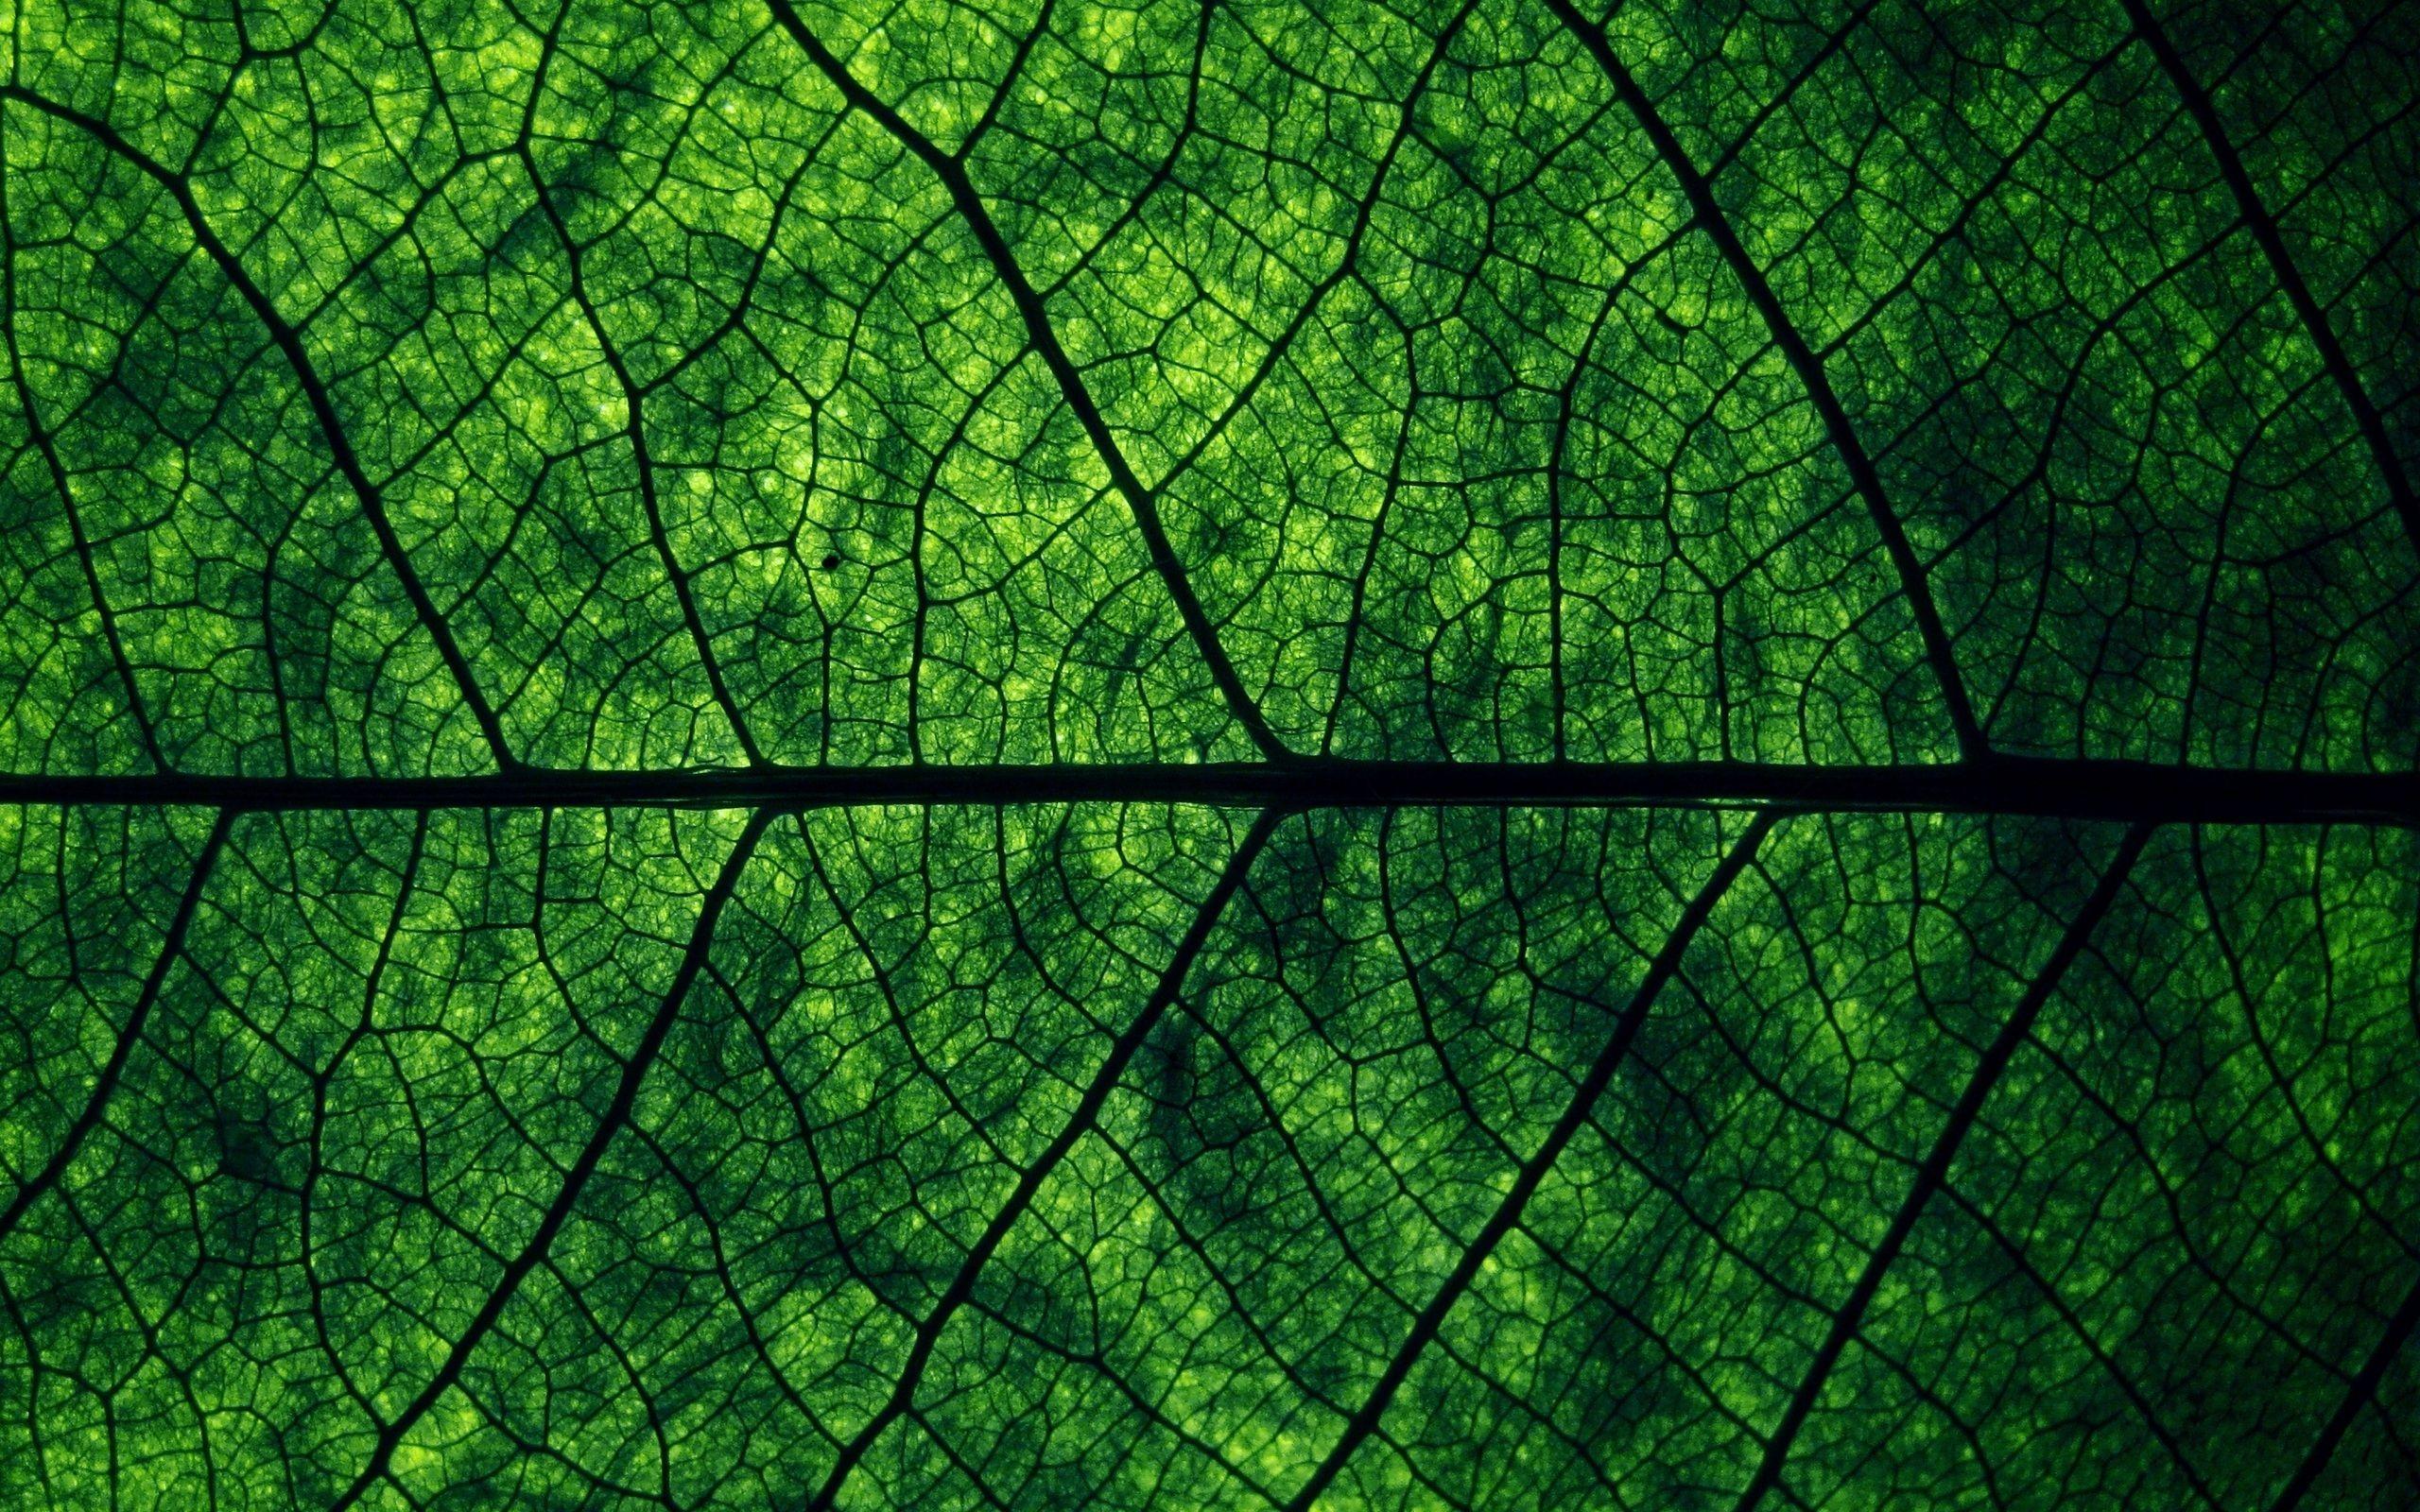 Green Leaf Makro Wallpapers 초록색 벽지 자연 배경화면 수채화